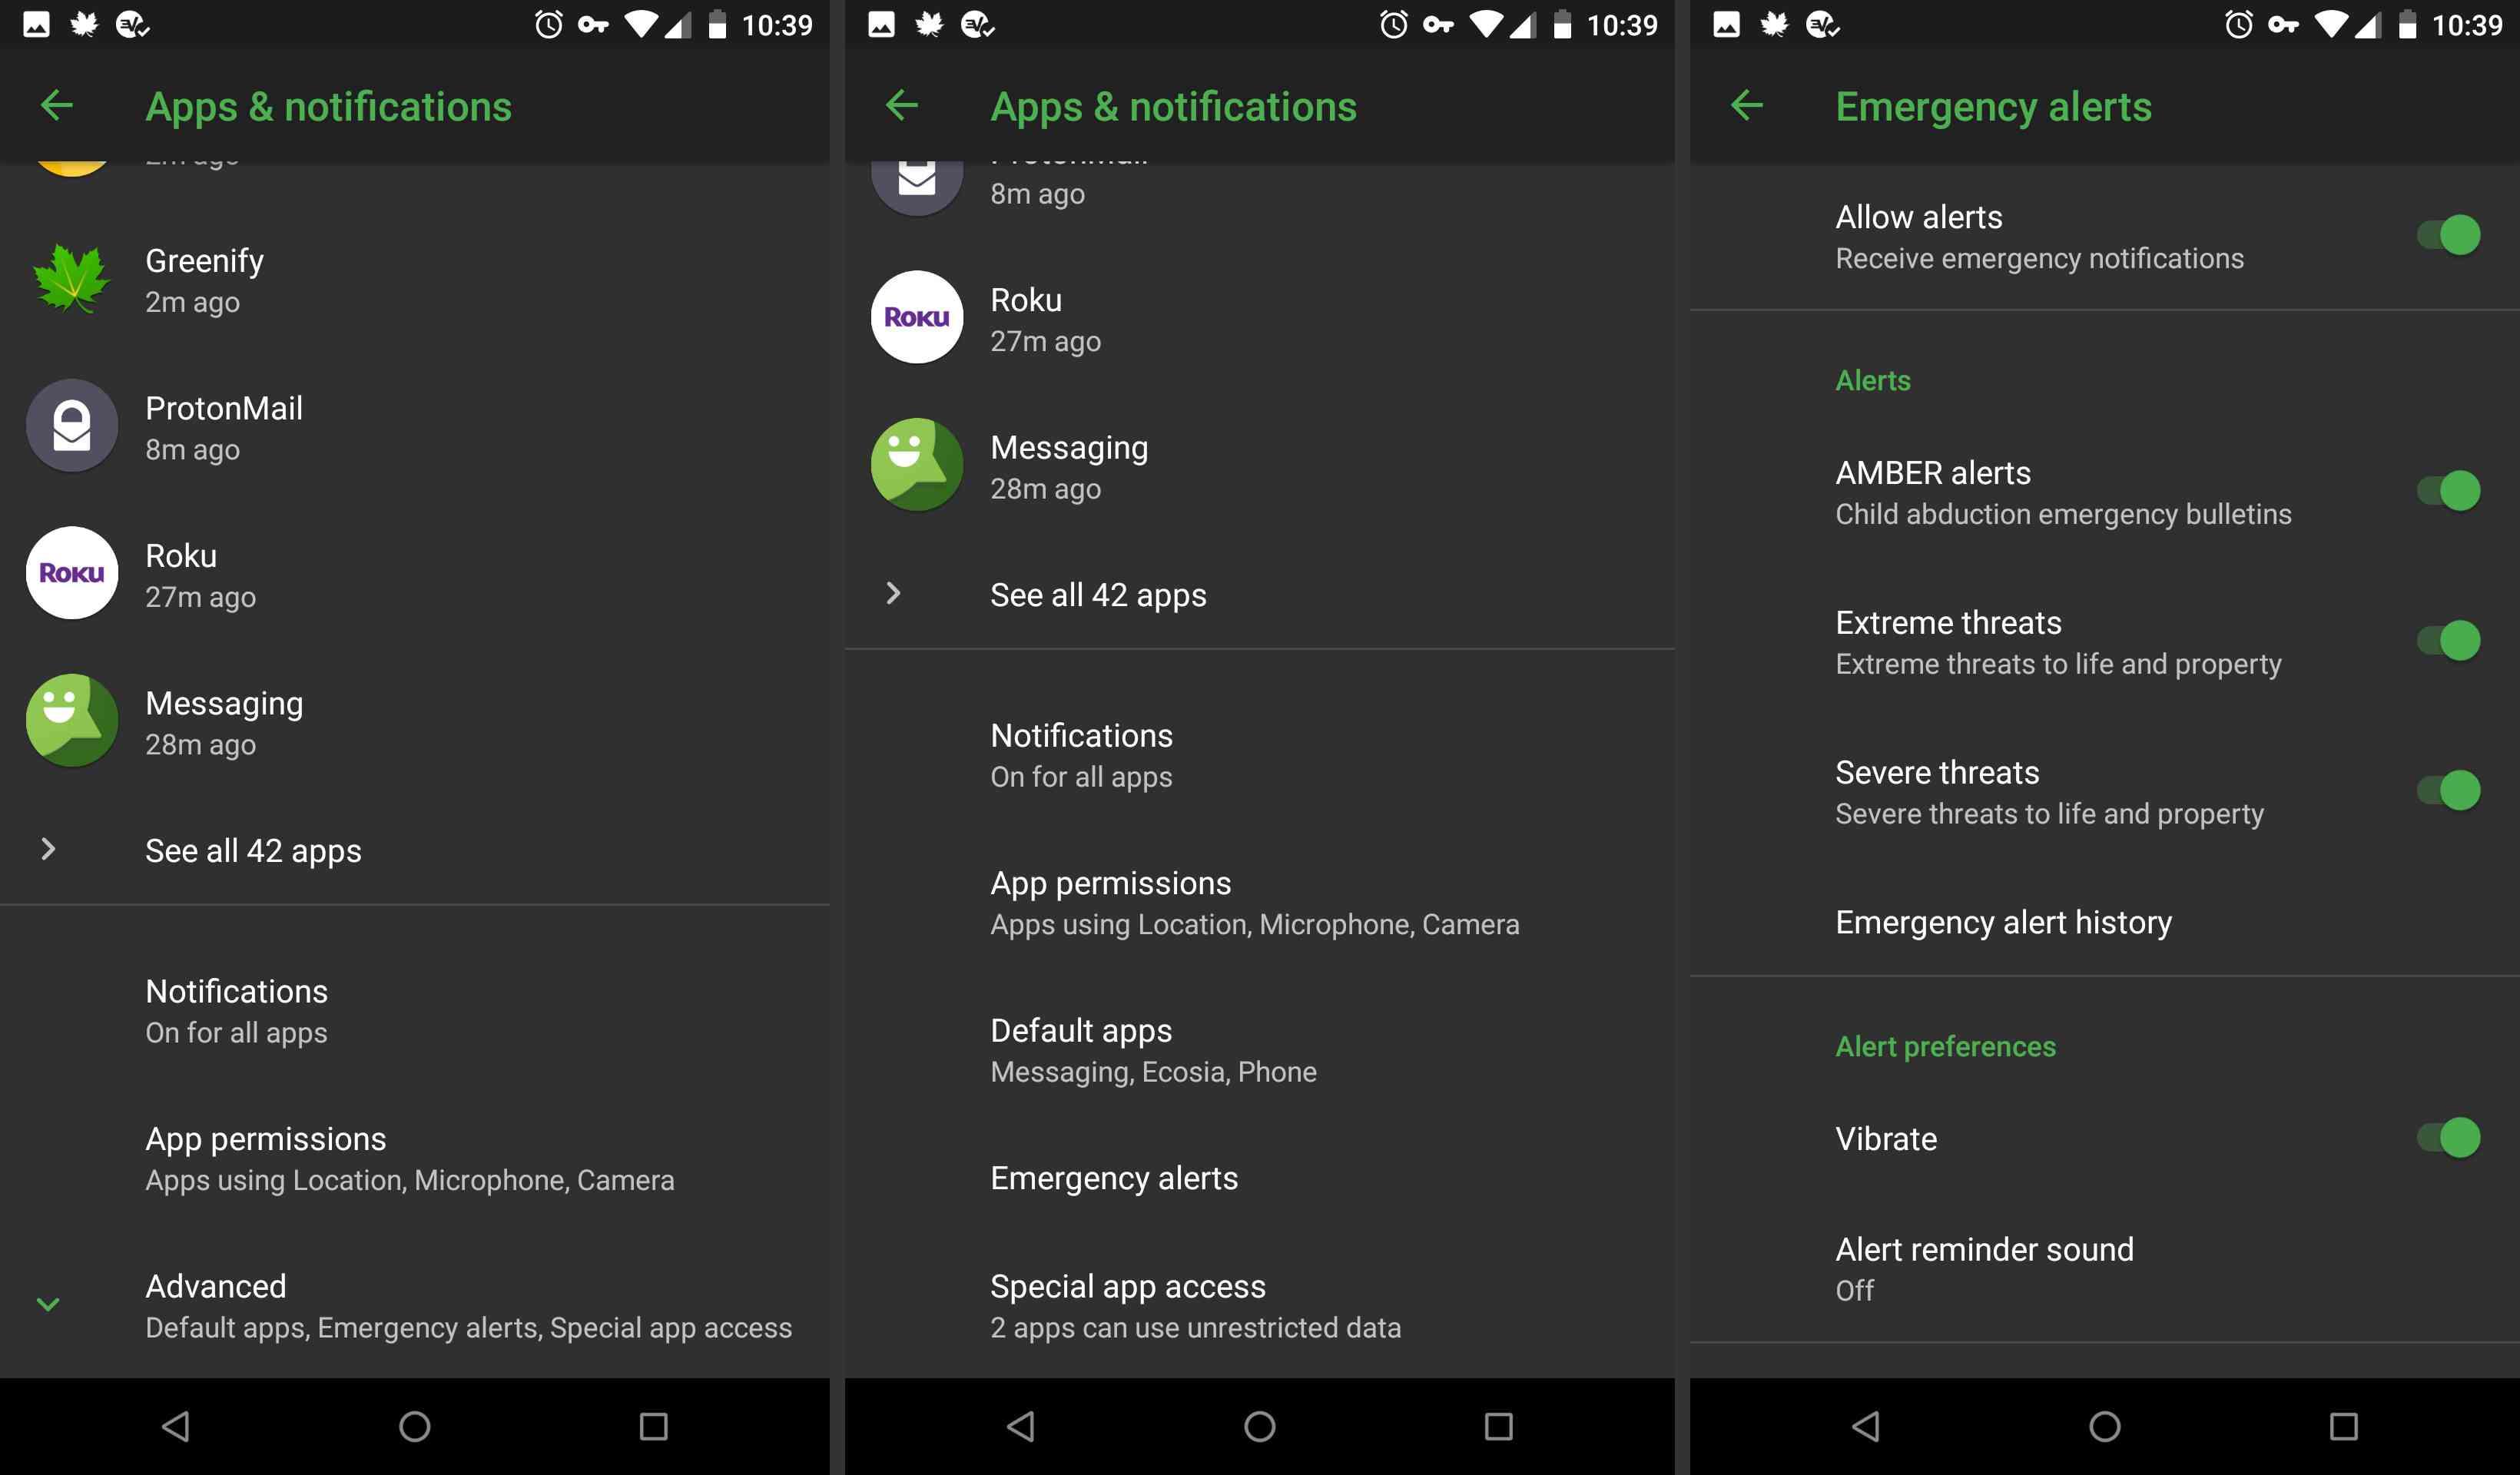 Android alert settings